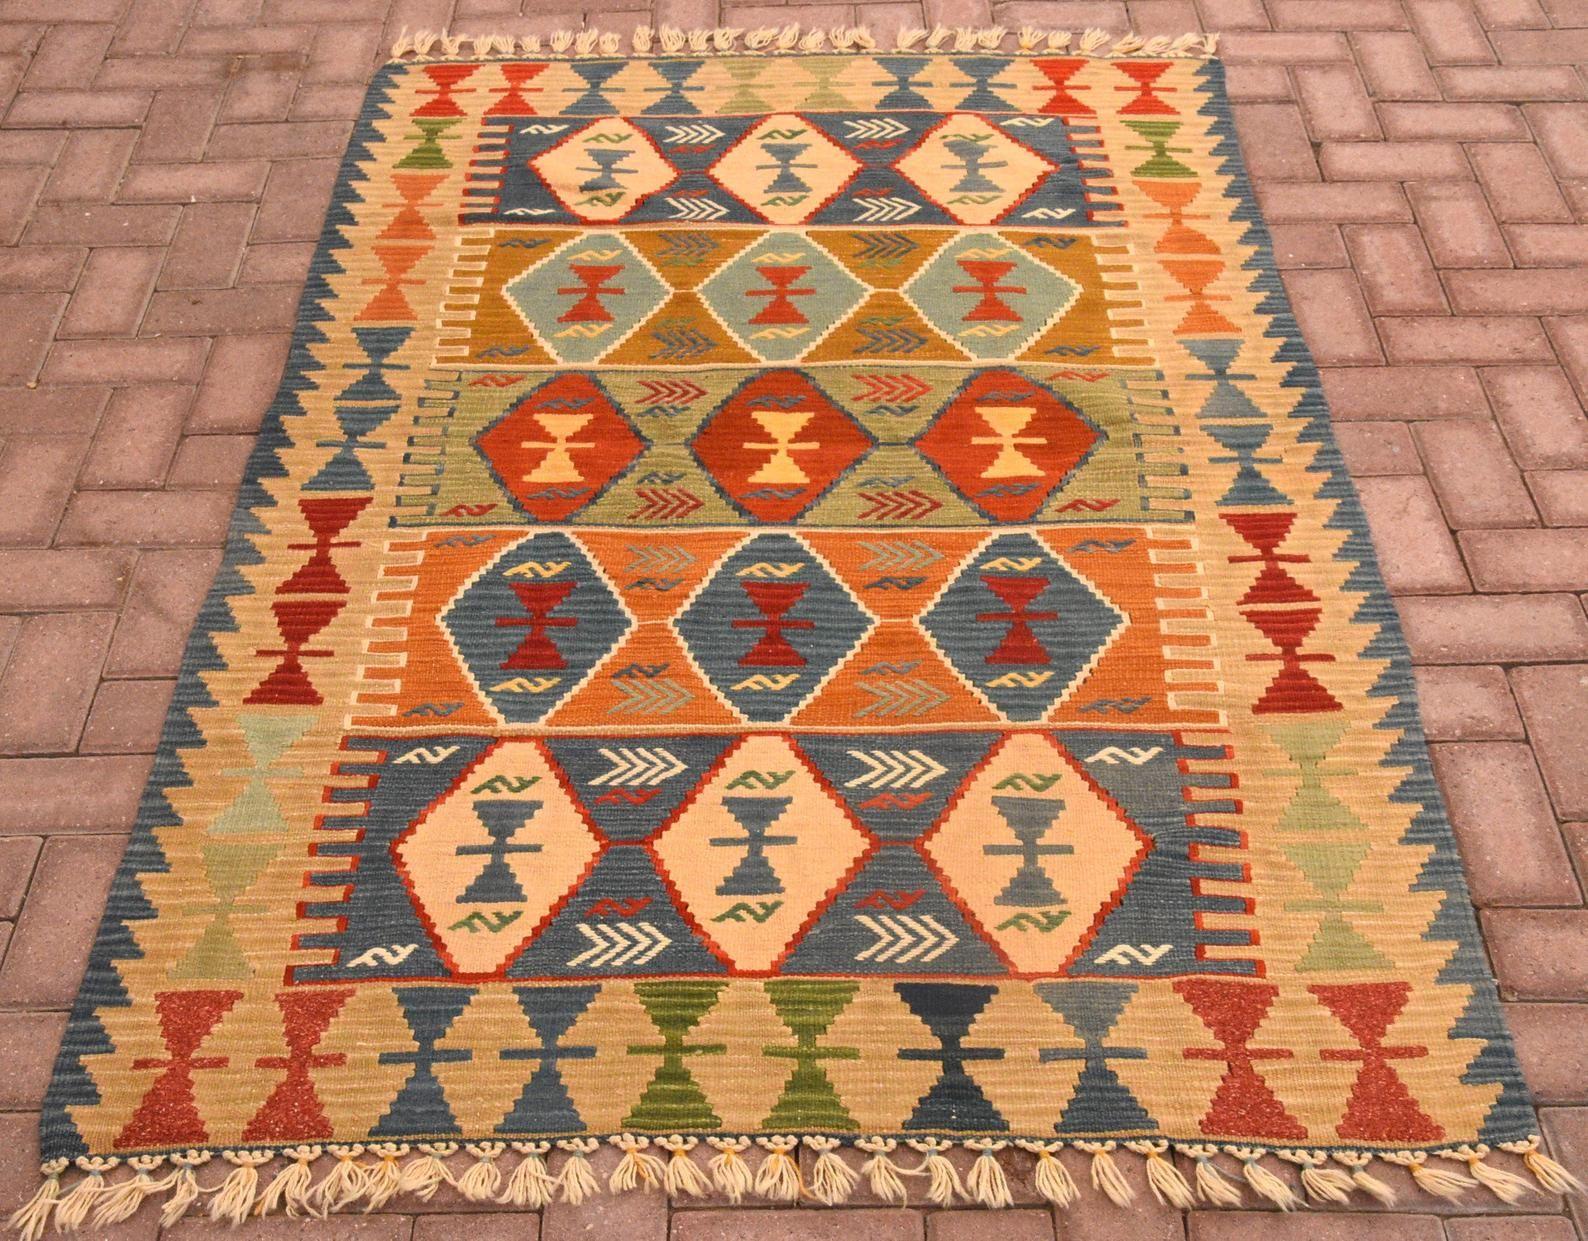 Geometric Design Kilim Vintage Handmade Kilim Turkish Etsy Kilim Woven Tribal Rug Kilim